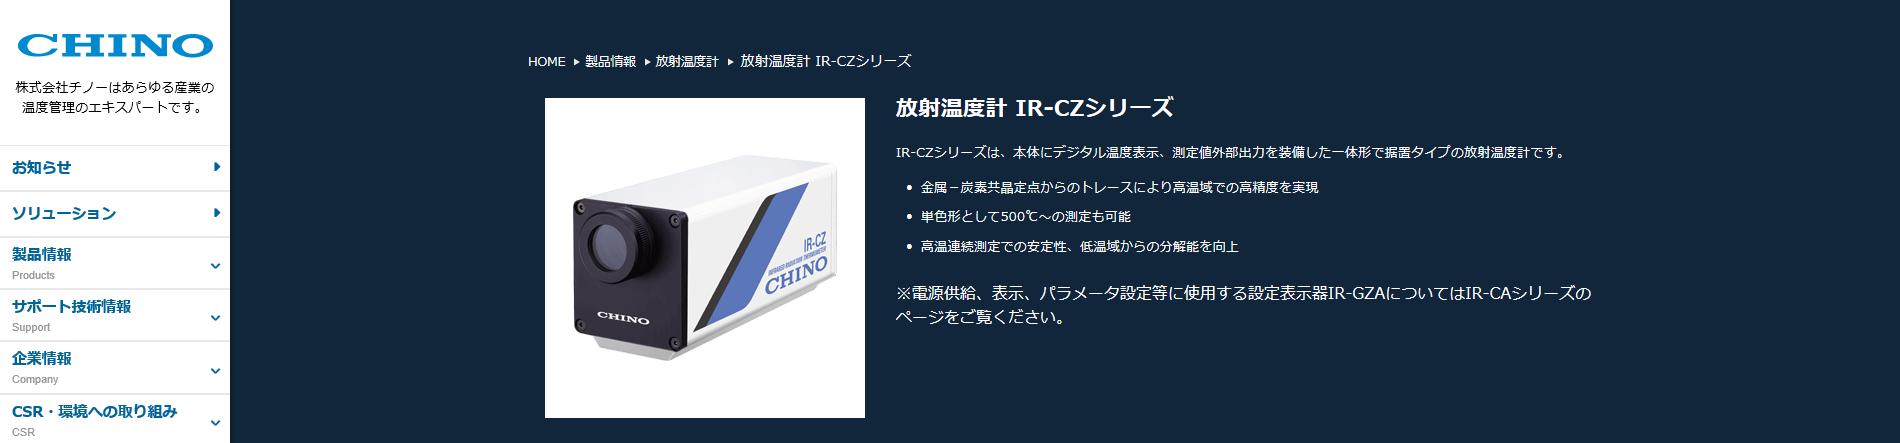 IR-CZシリーズ